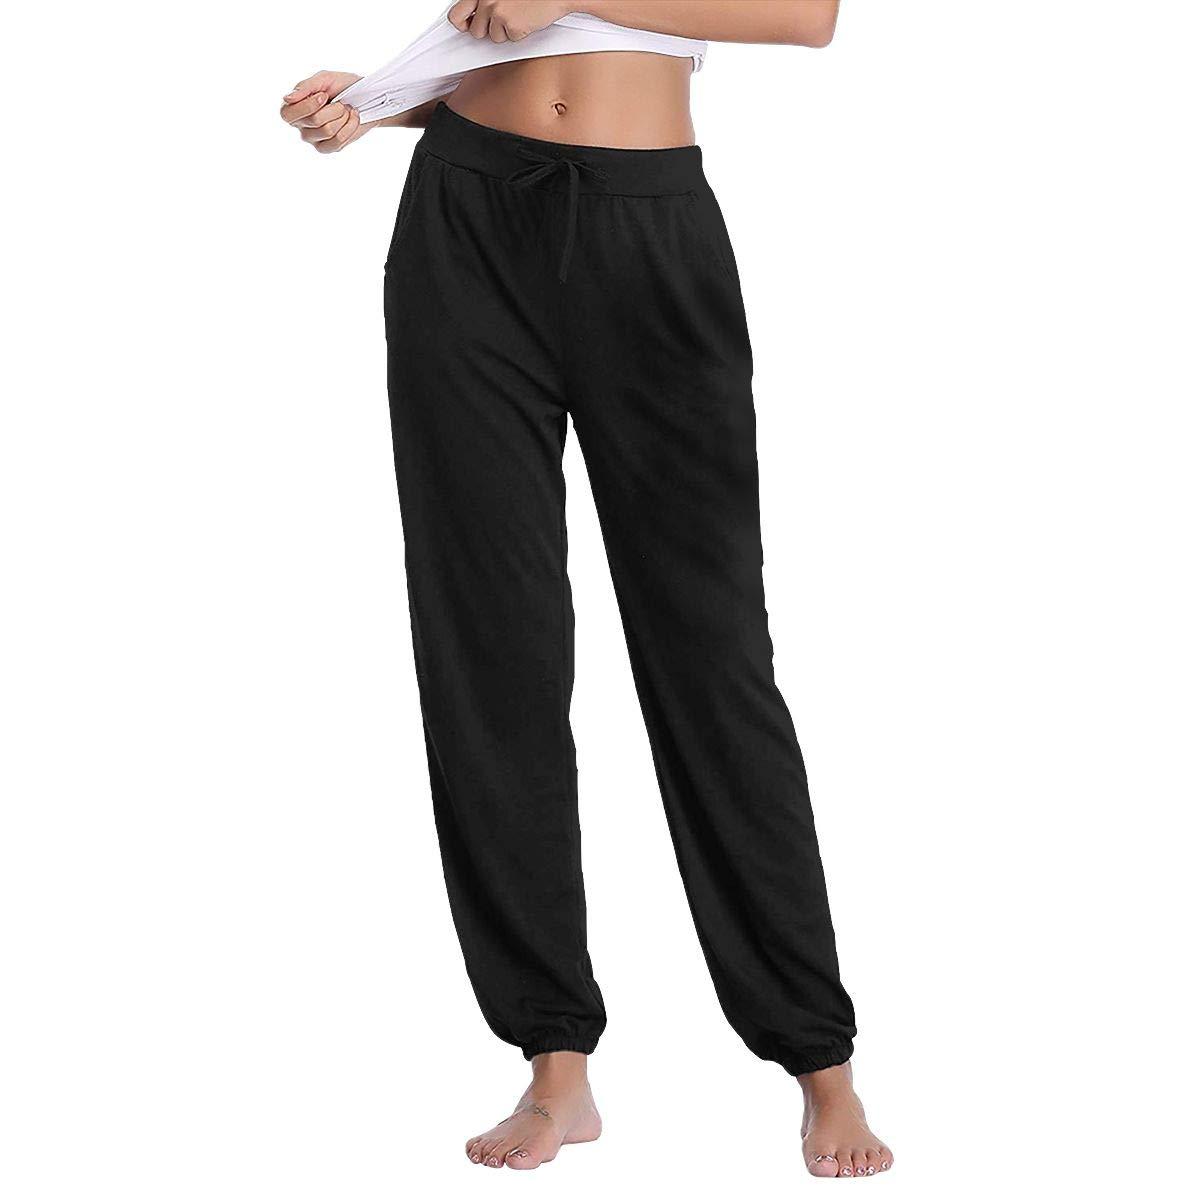 Amazon.com: Lesi Yes Womens Jogger Sweatpants Size Matters ...